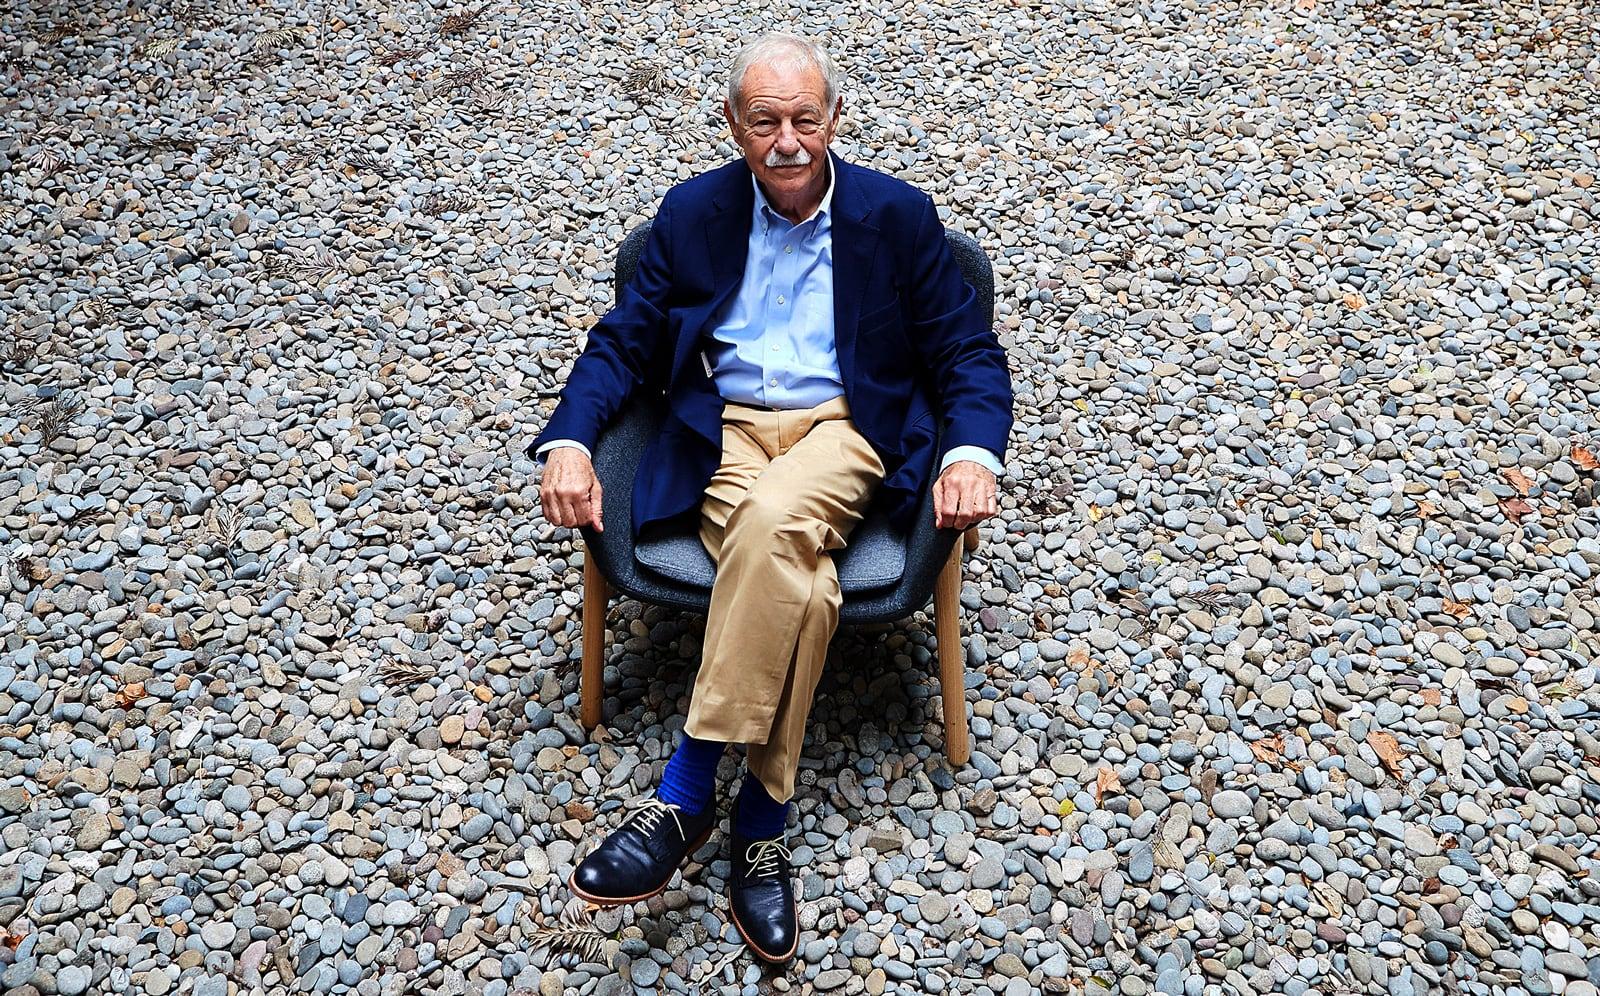 L'escriptor Eduardo Mendoza retratat el 2019 per Alejandro García. Efe.